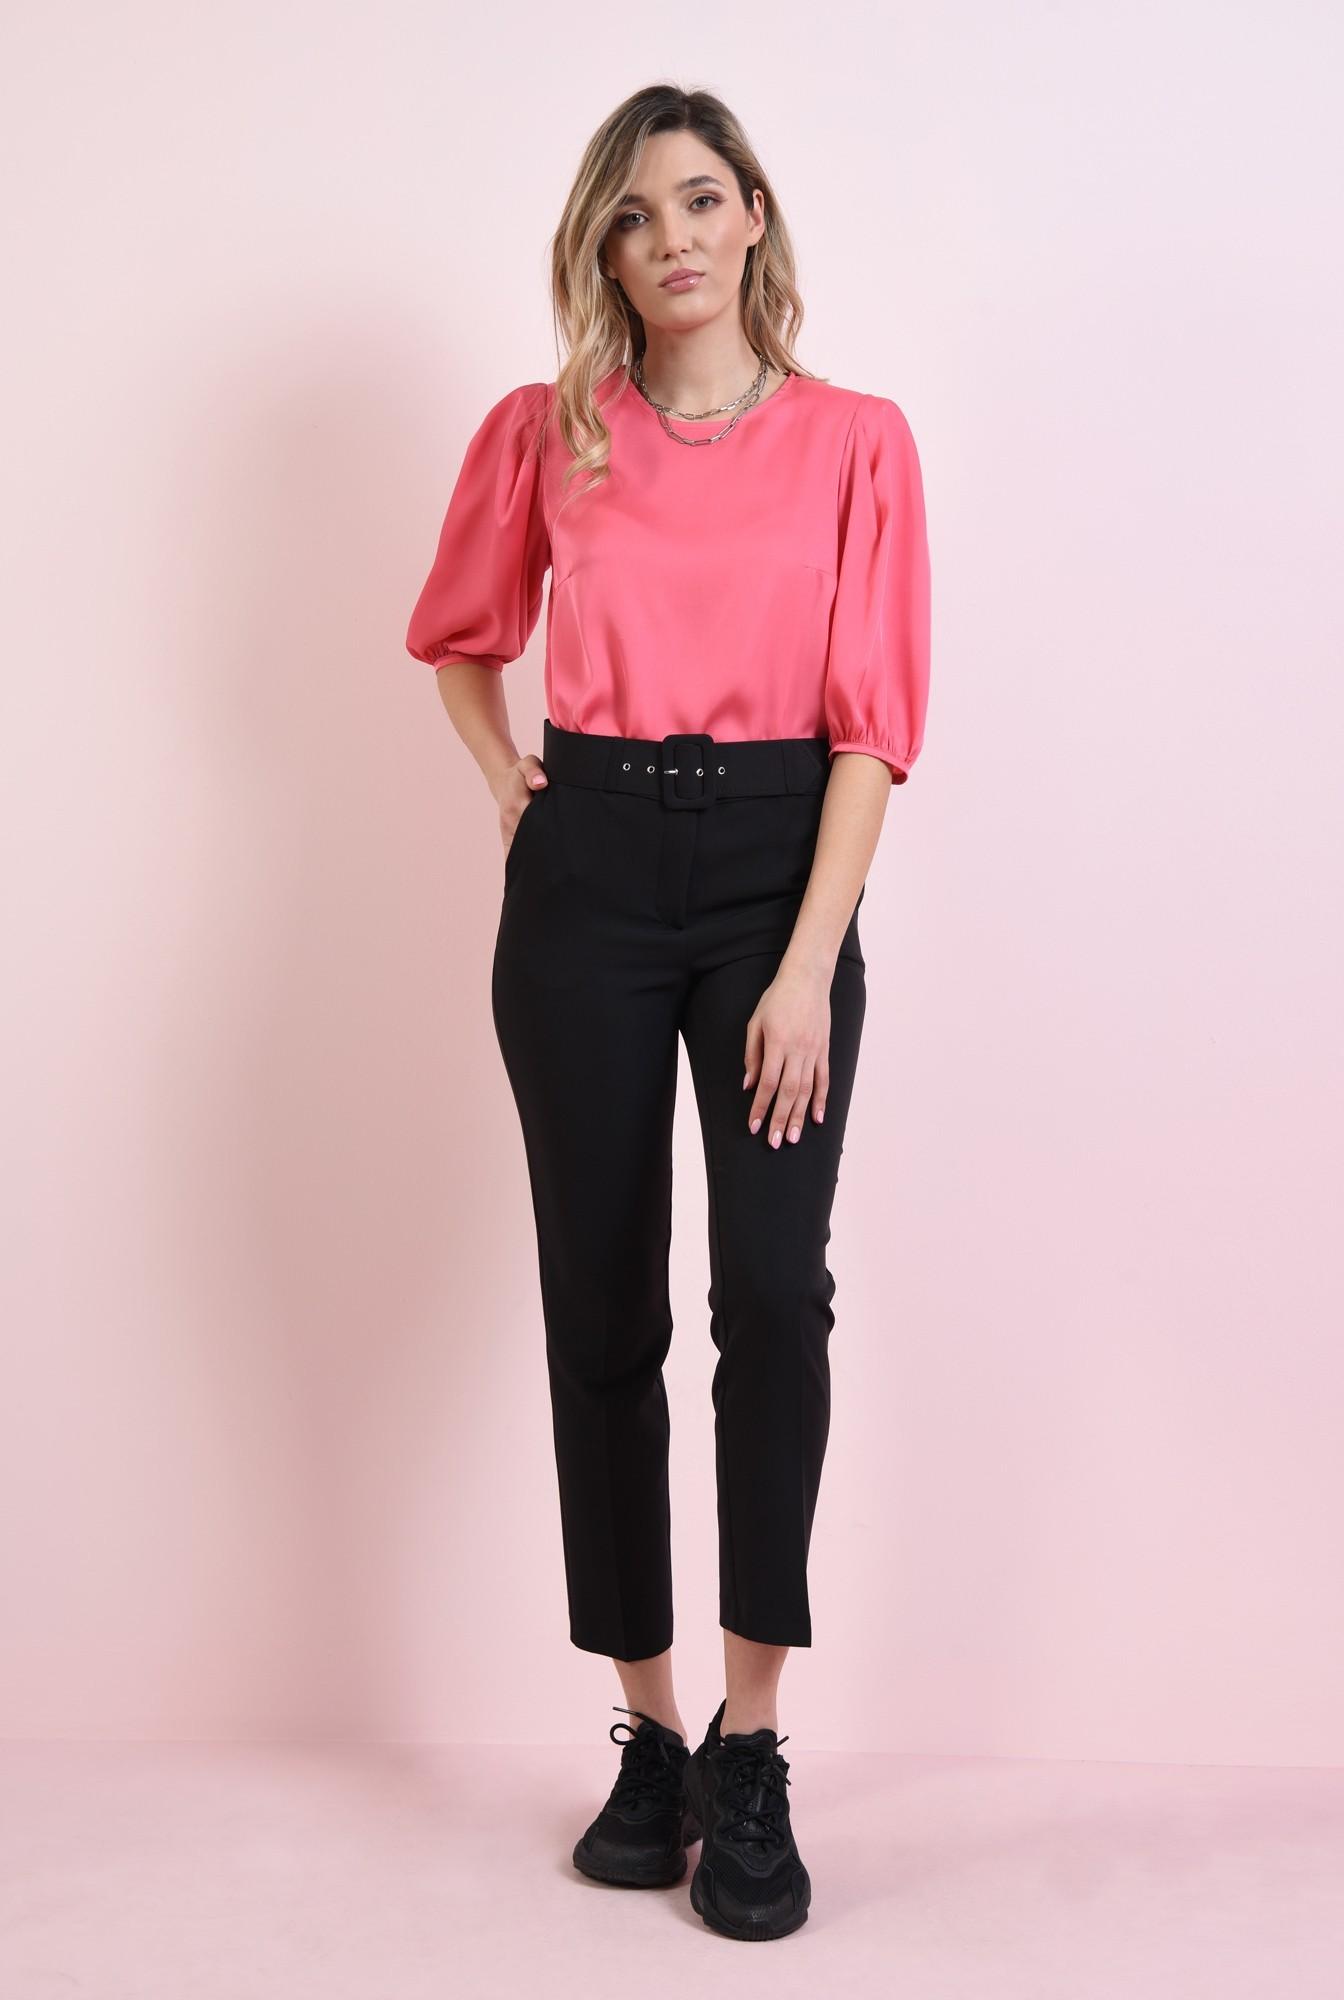 0 - bluza matasoasa, roz, cu maneci bufante